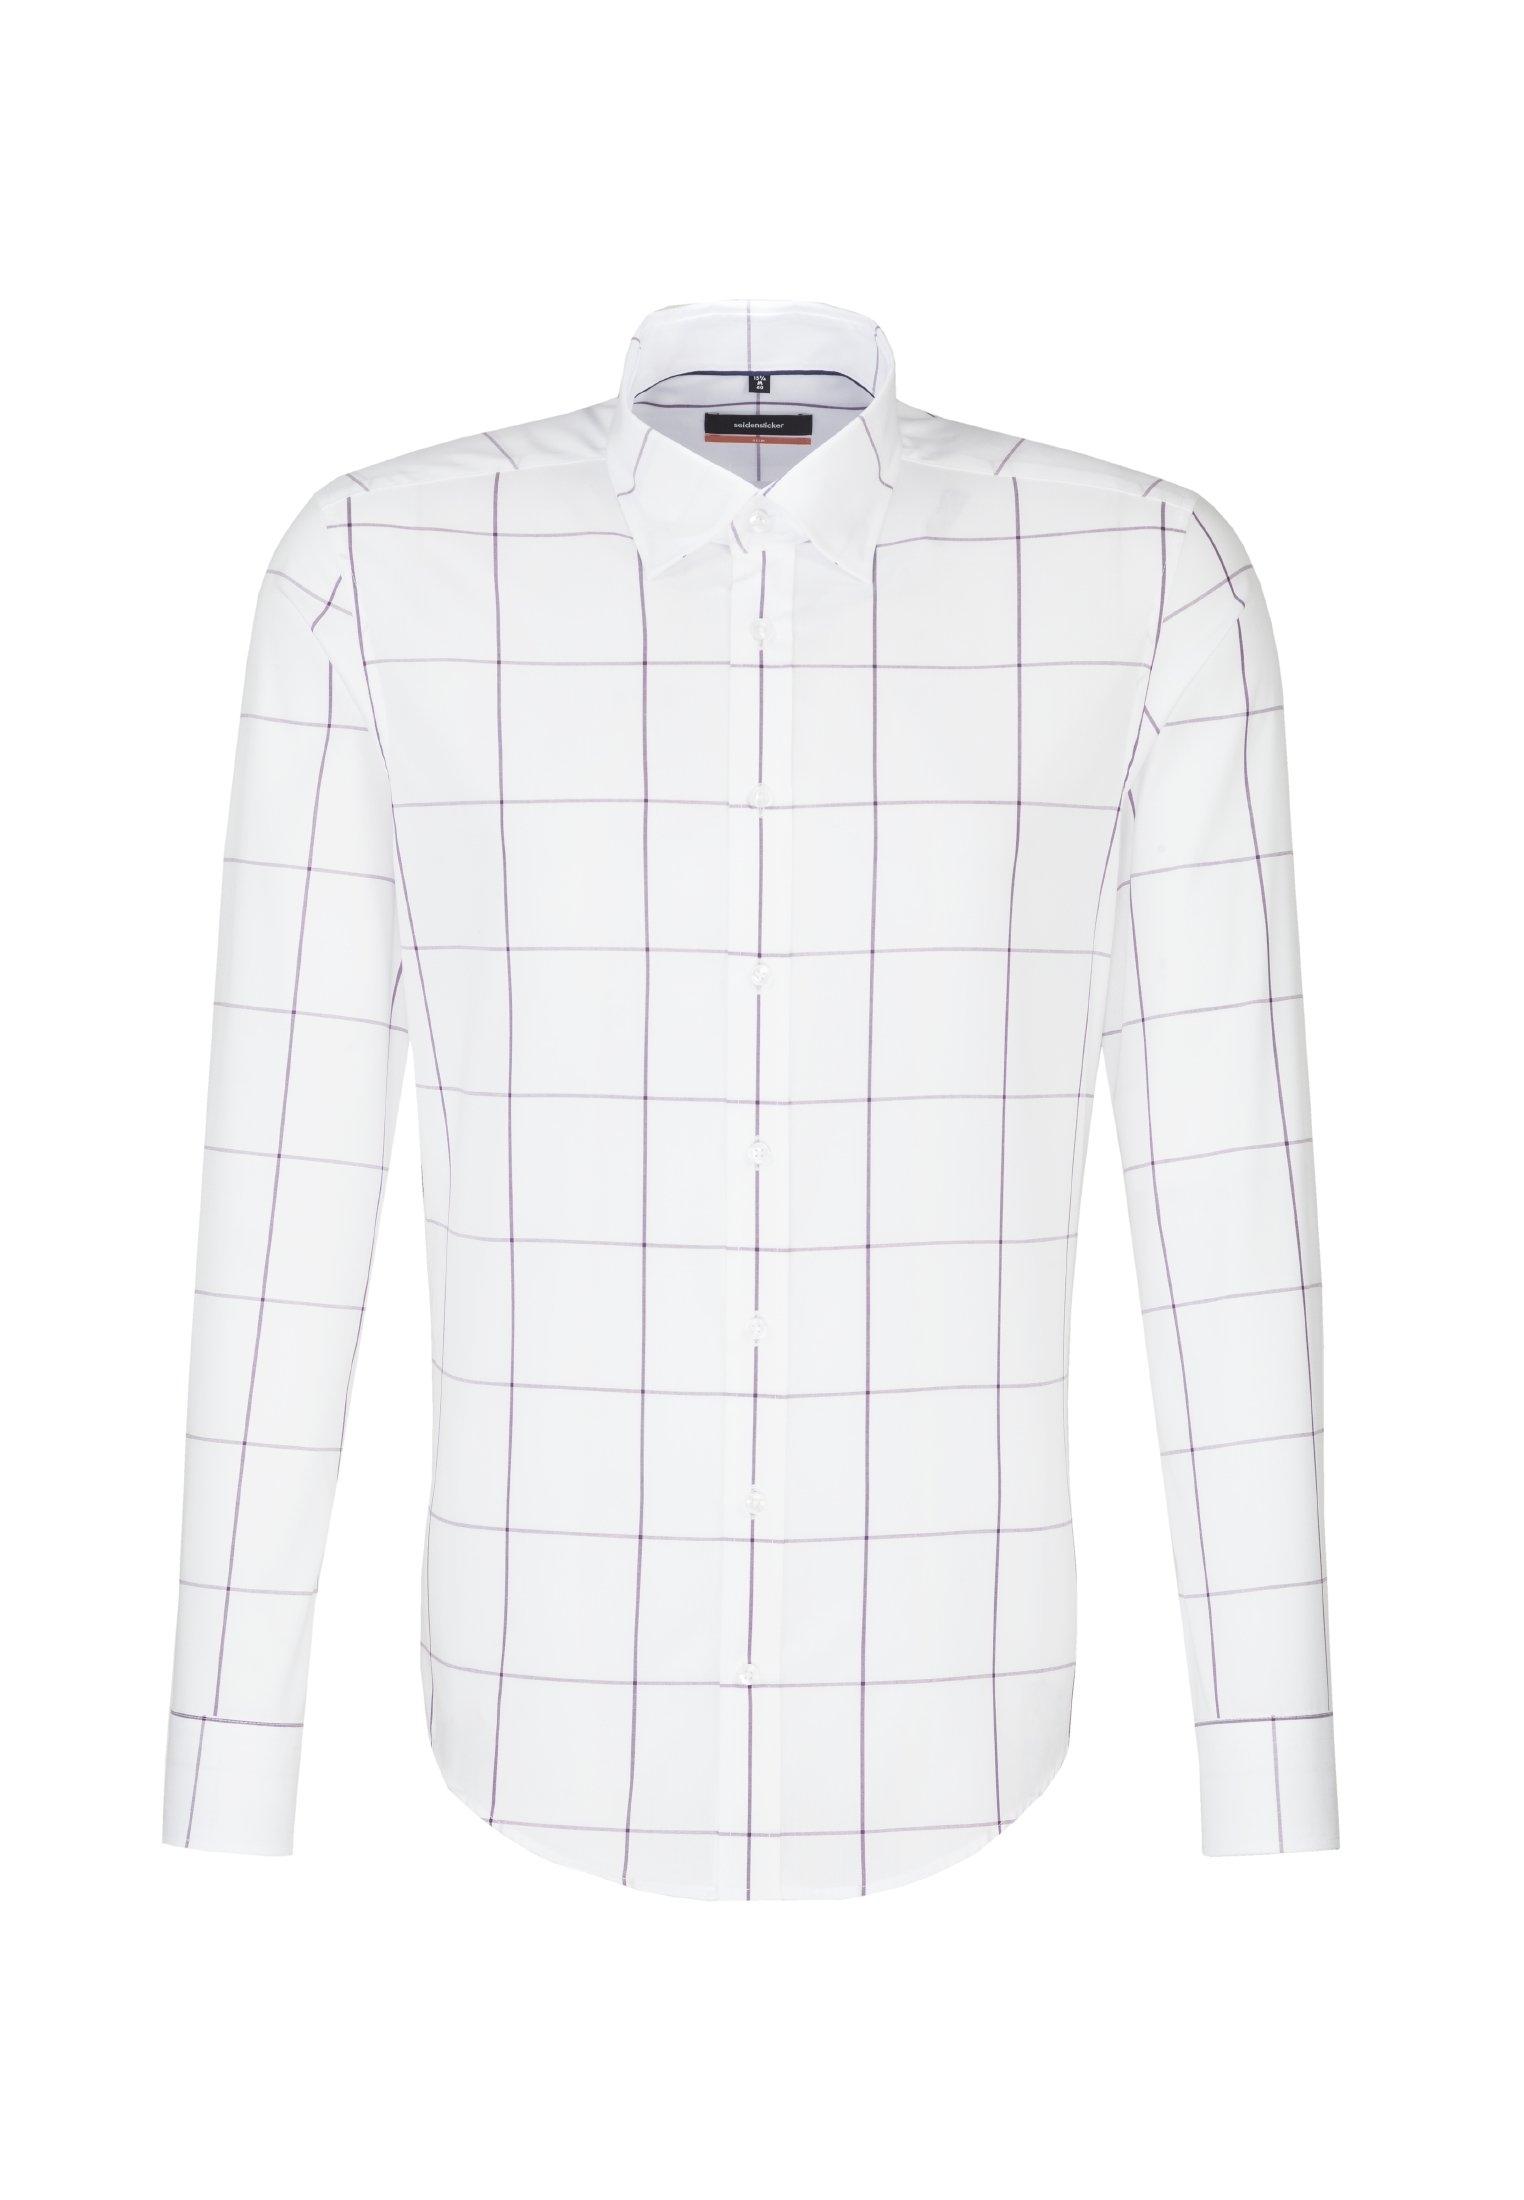 seidensticker businessoverhemd »Slim« voordelig en veilig online kopen